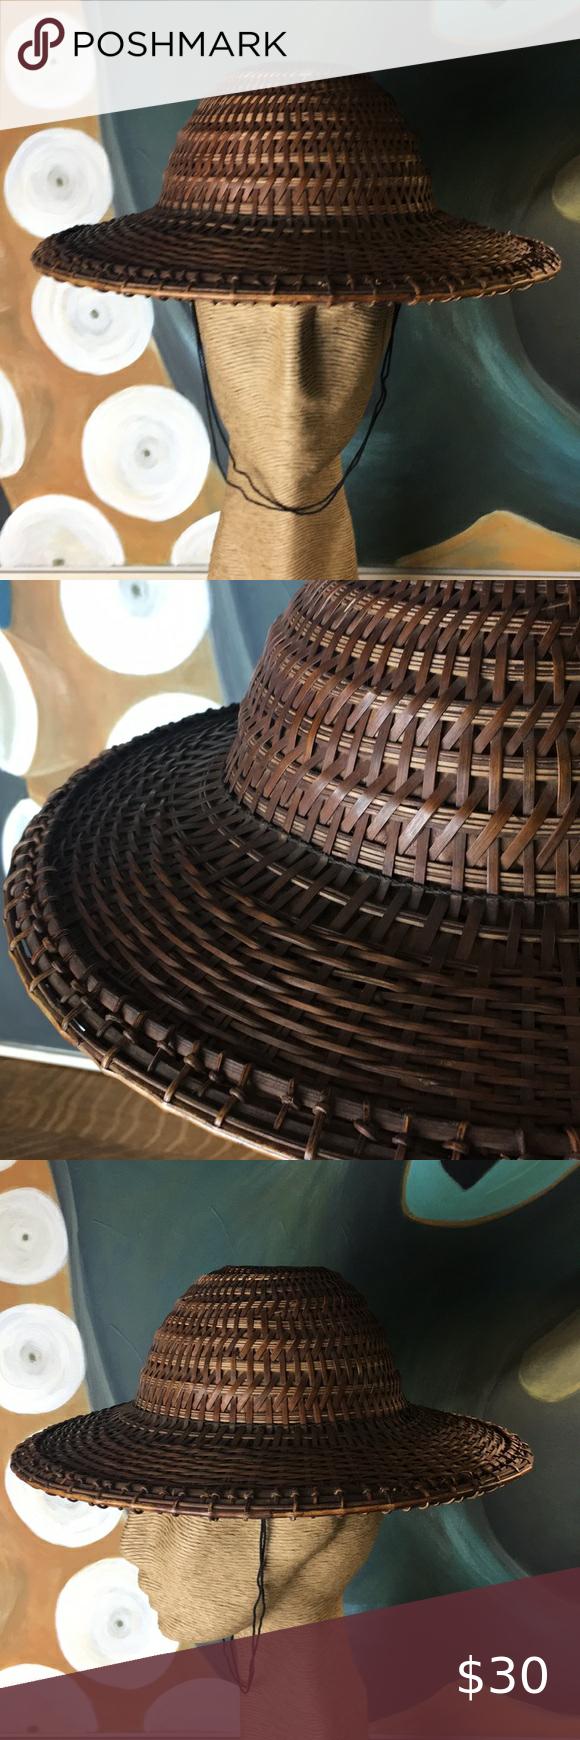 Asian Handmade Bamboo Woven Hat Hats Vintage Bamboo Weaving Woven